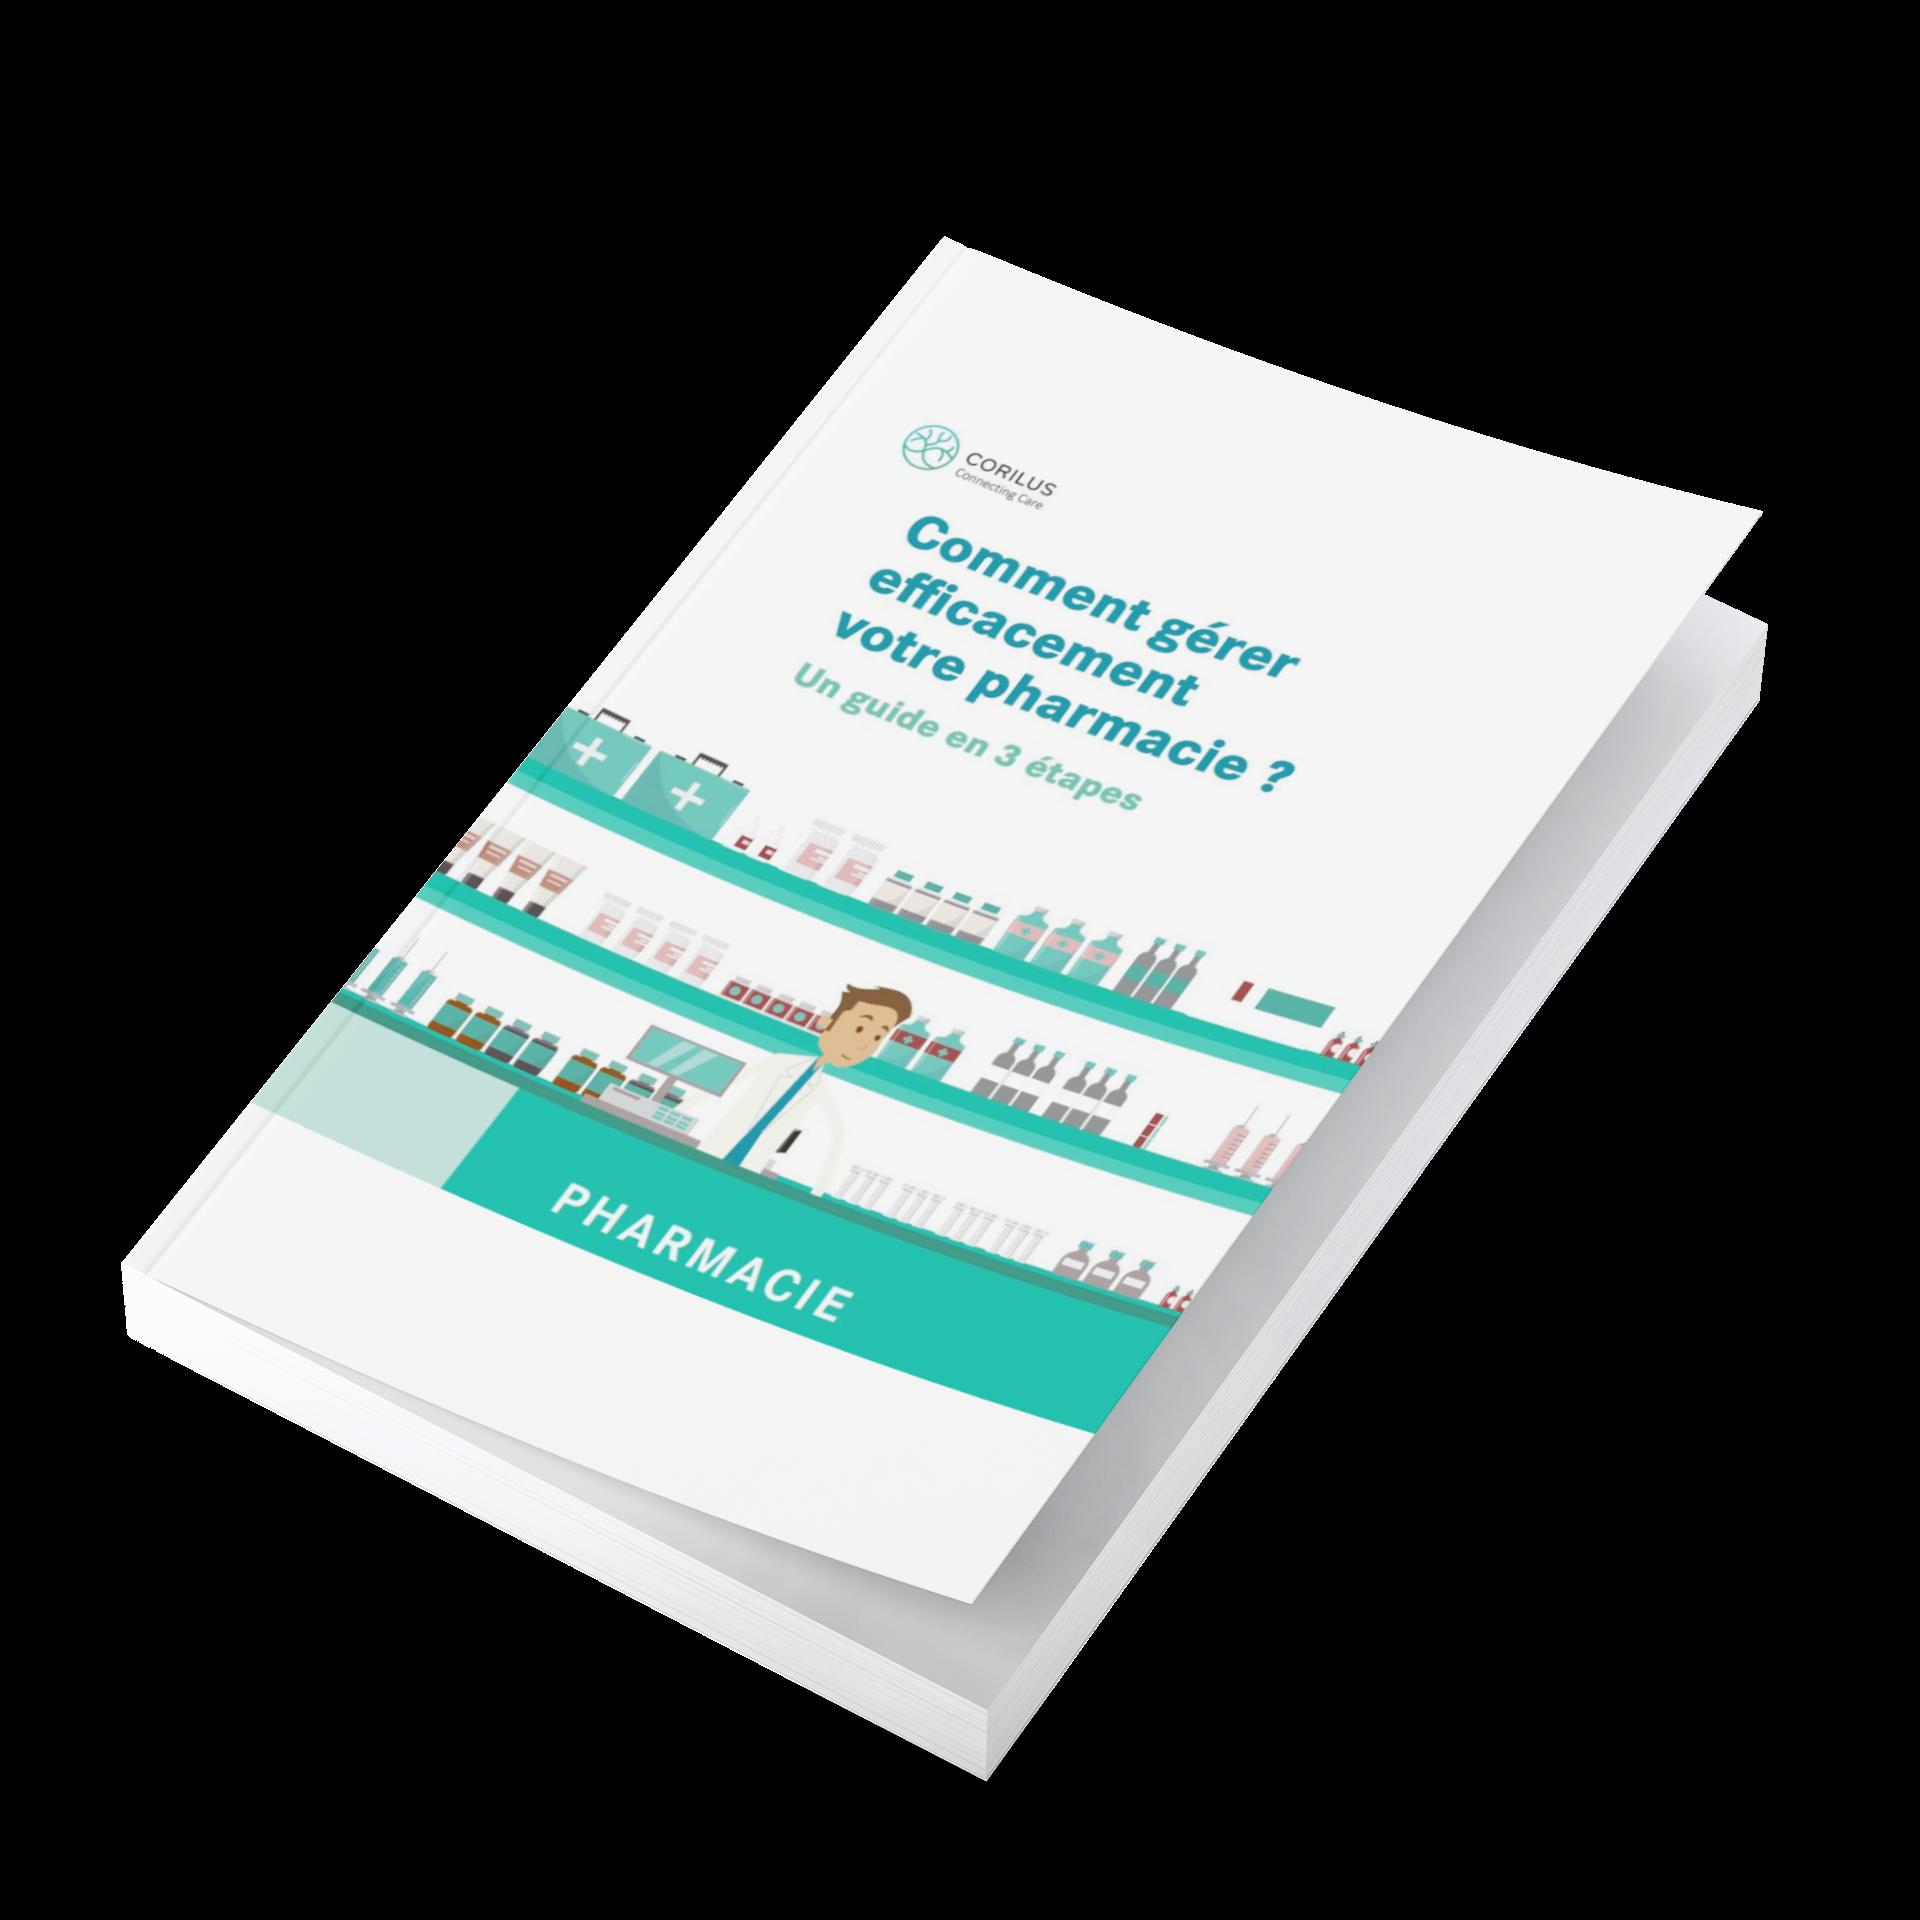 Pharma - mockup cover ebook 1 - FR.JPG